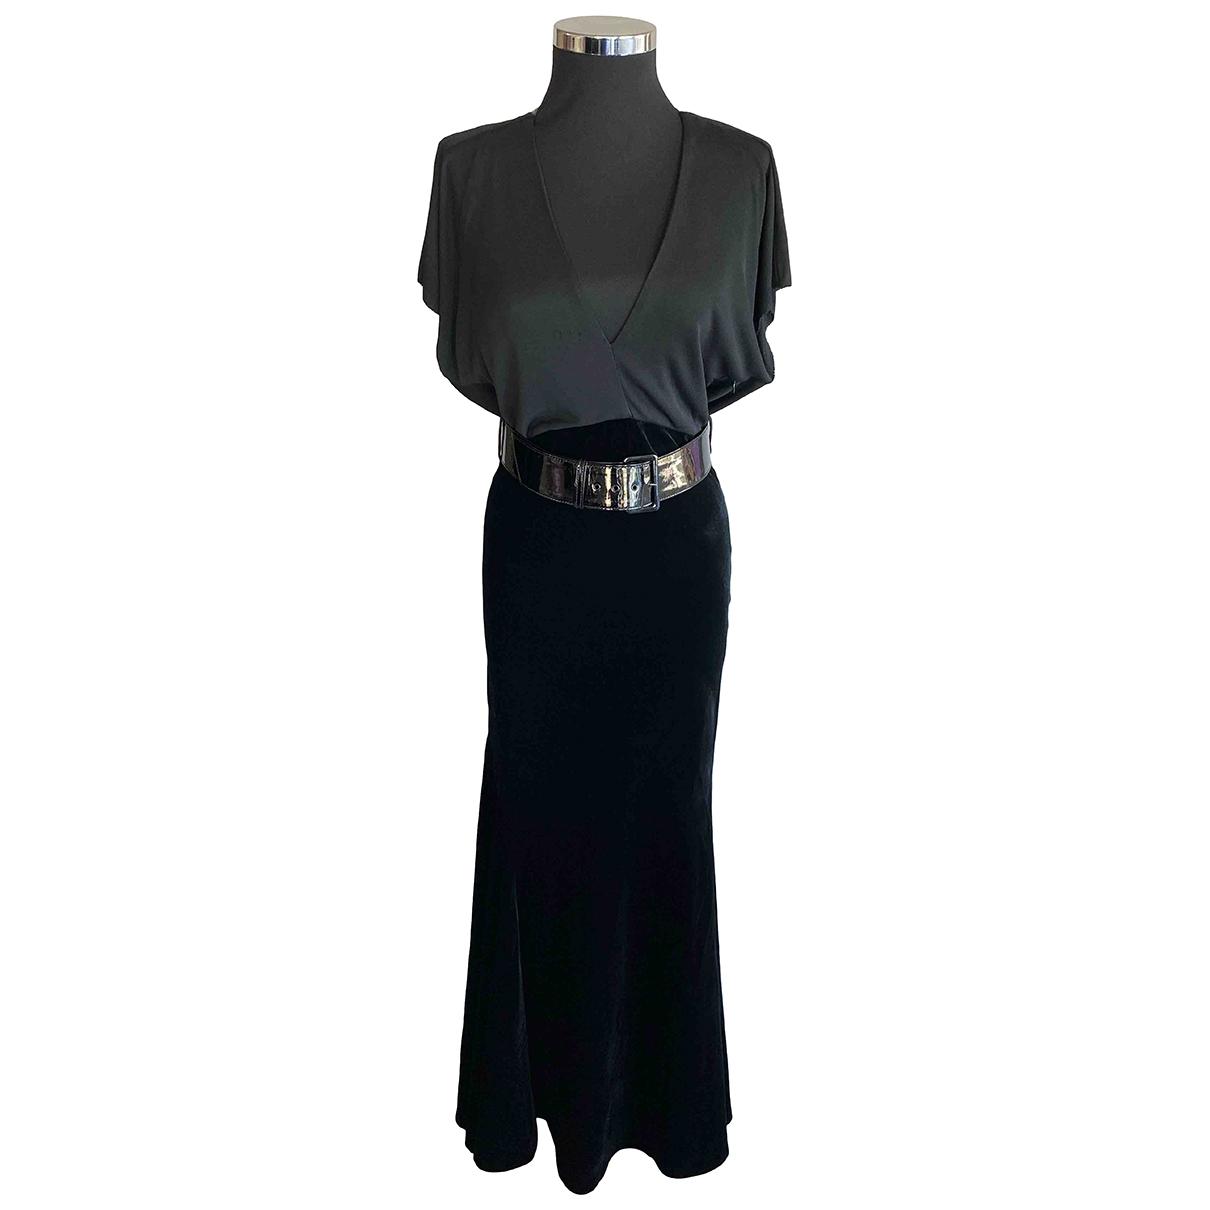 Jean Paul Gaultier - Robe   pour femme en velours - noir